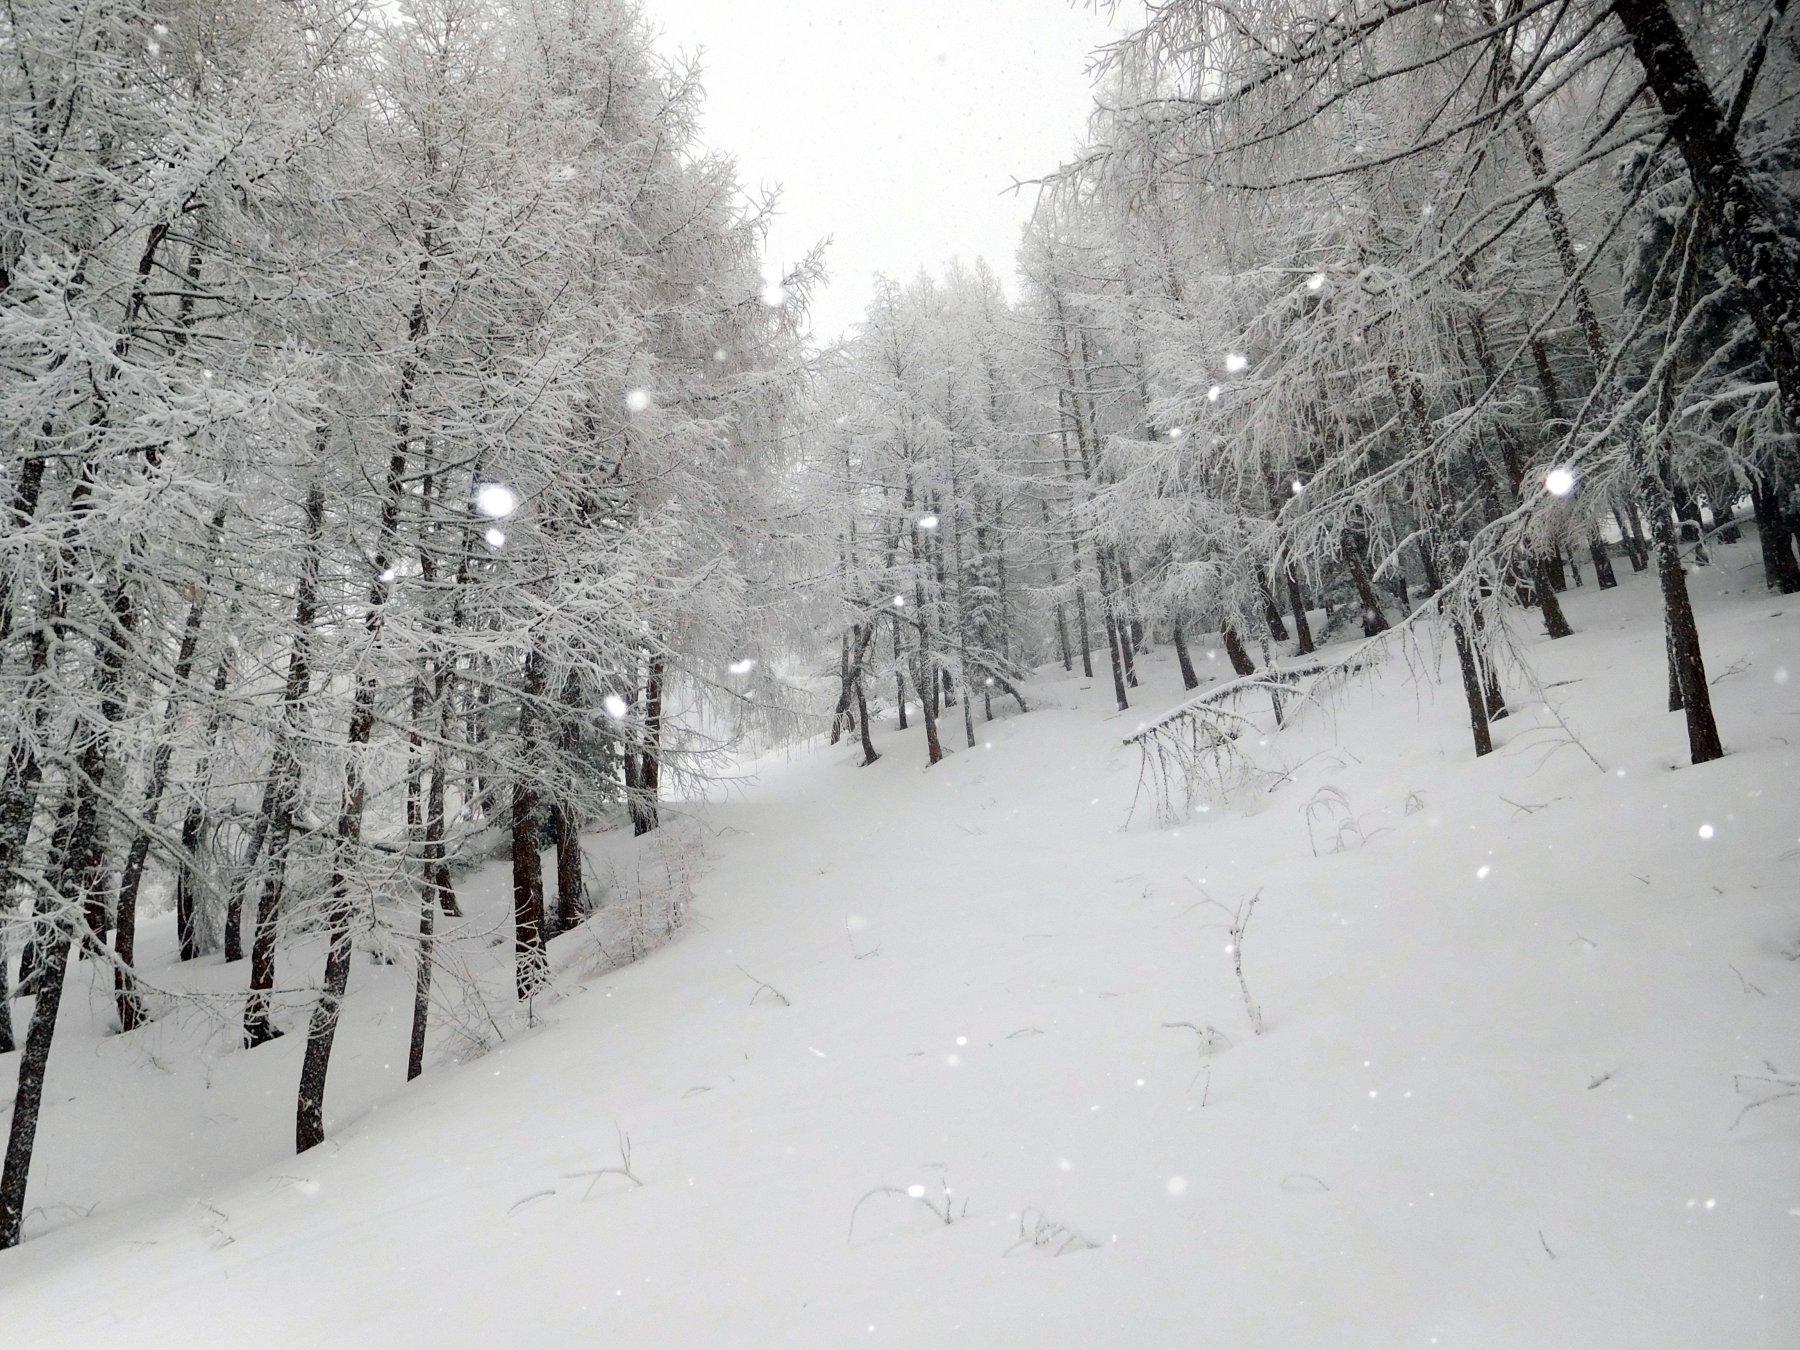 bosco incantevole